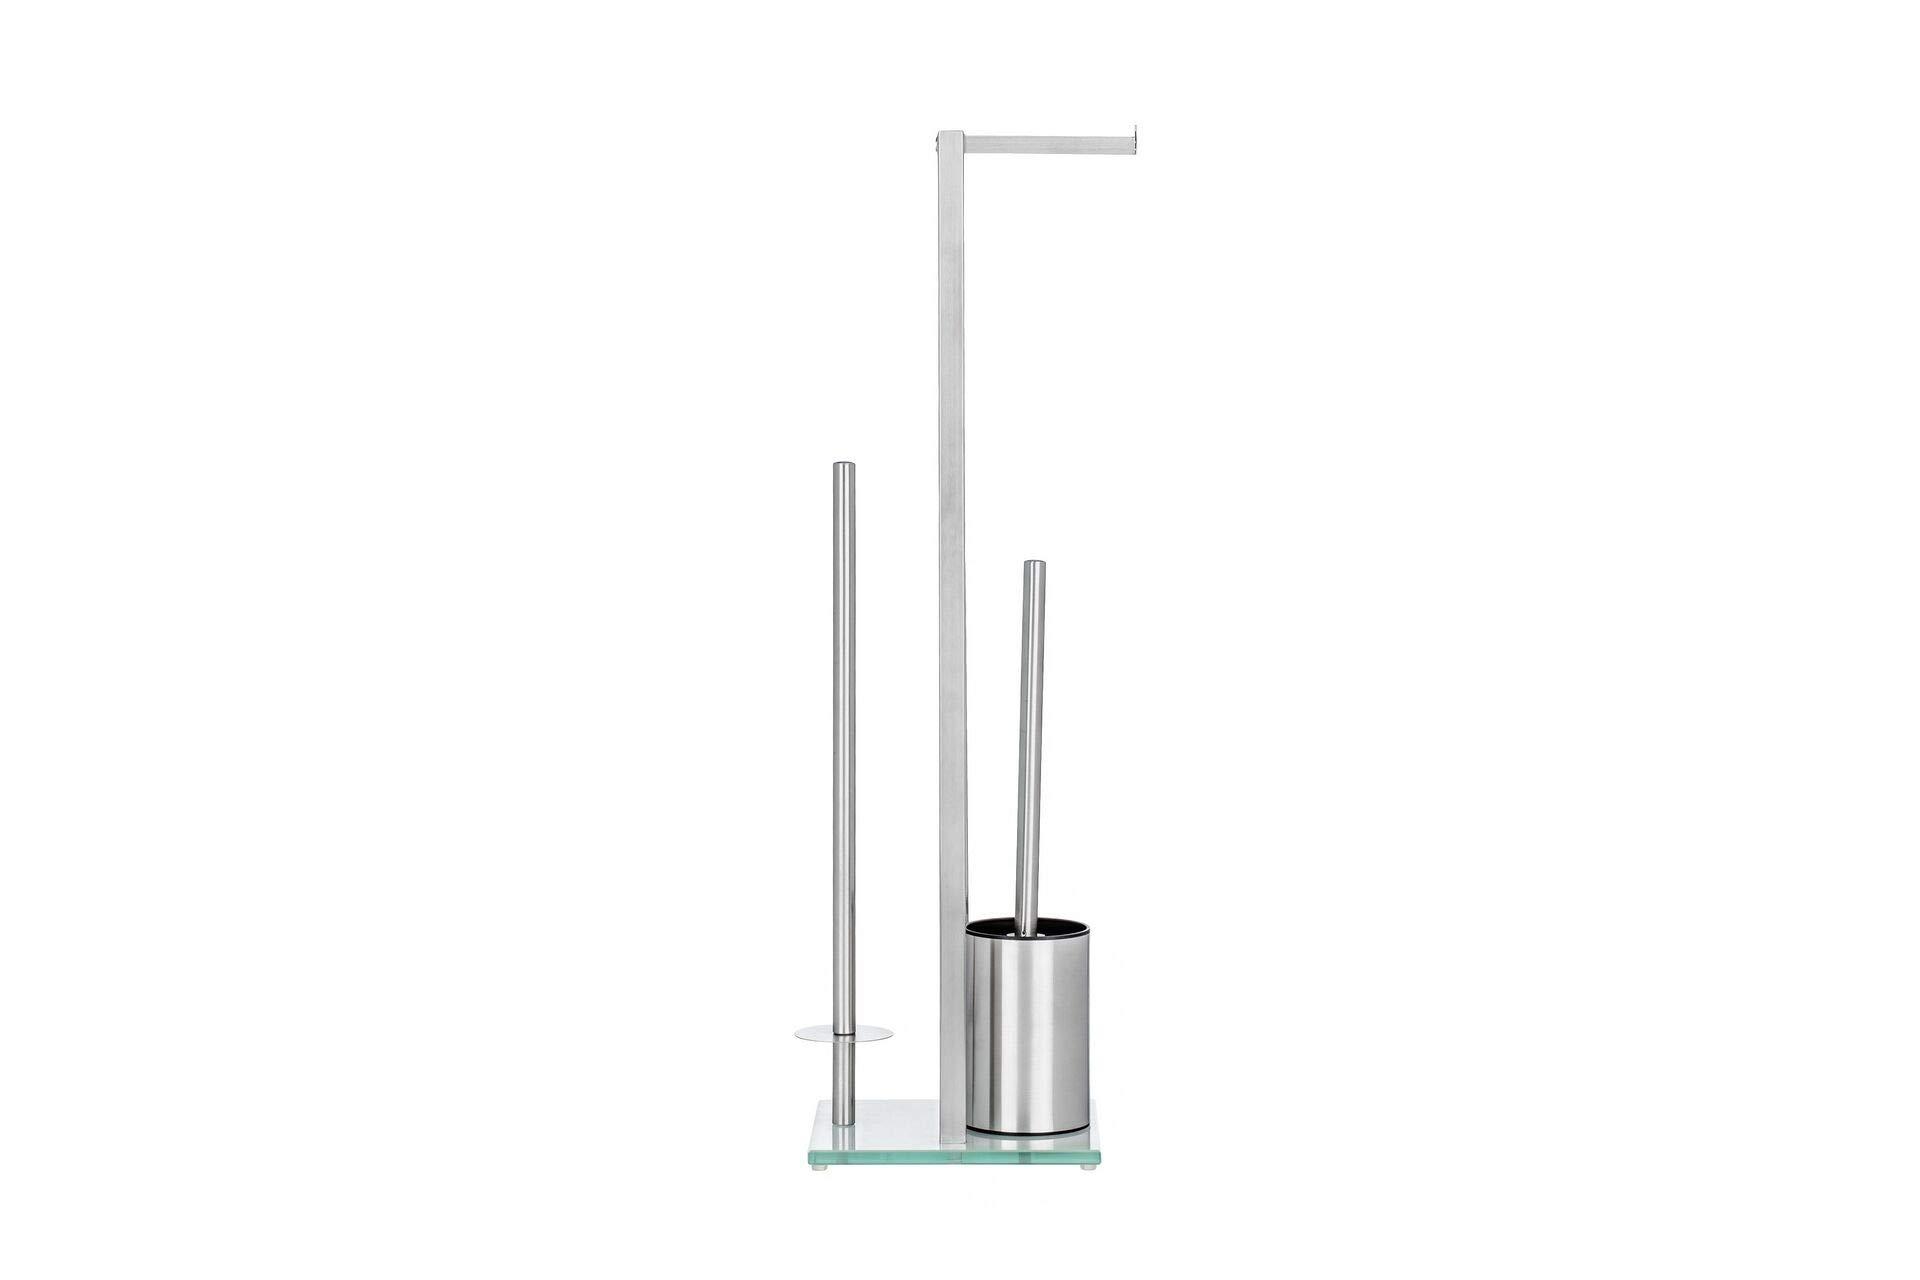 Jiallo WE-THFY01 Toilet Brush Set, Standard, Silver by Jiallo